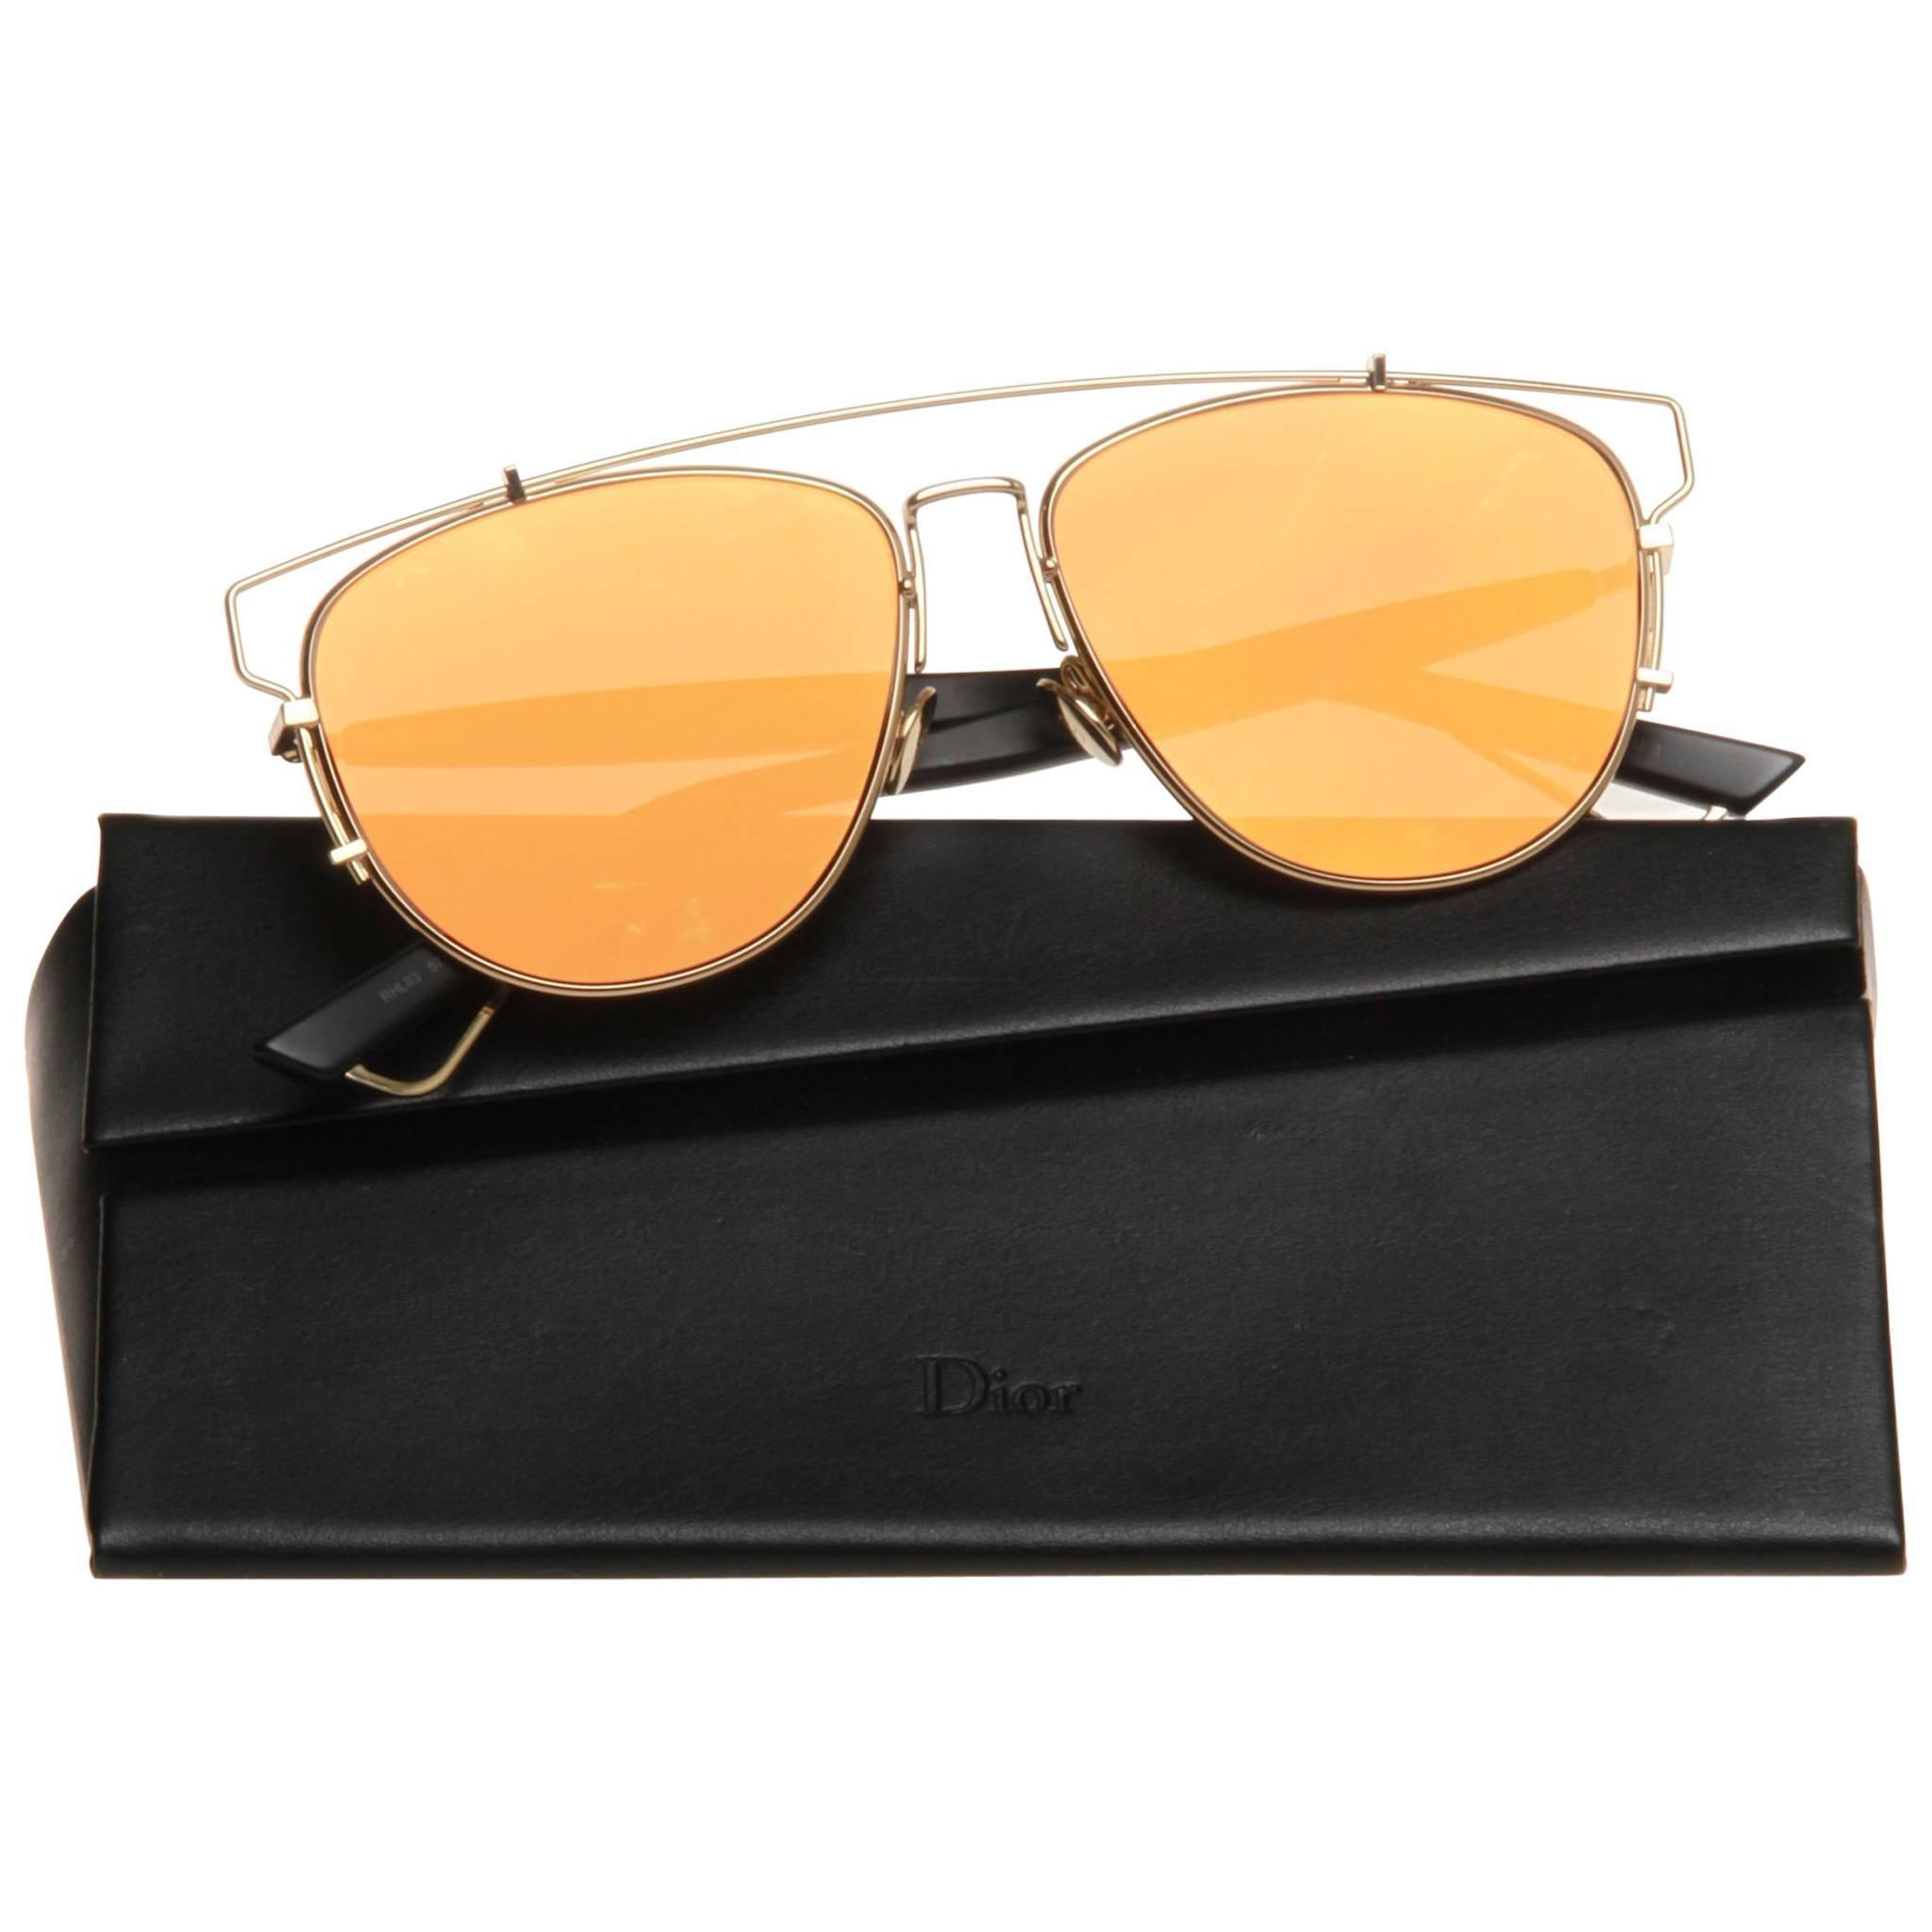 6a84cbd429af Christian Dior Technologic Aviator Sunglasses at 1stdibs